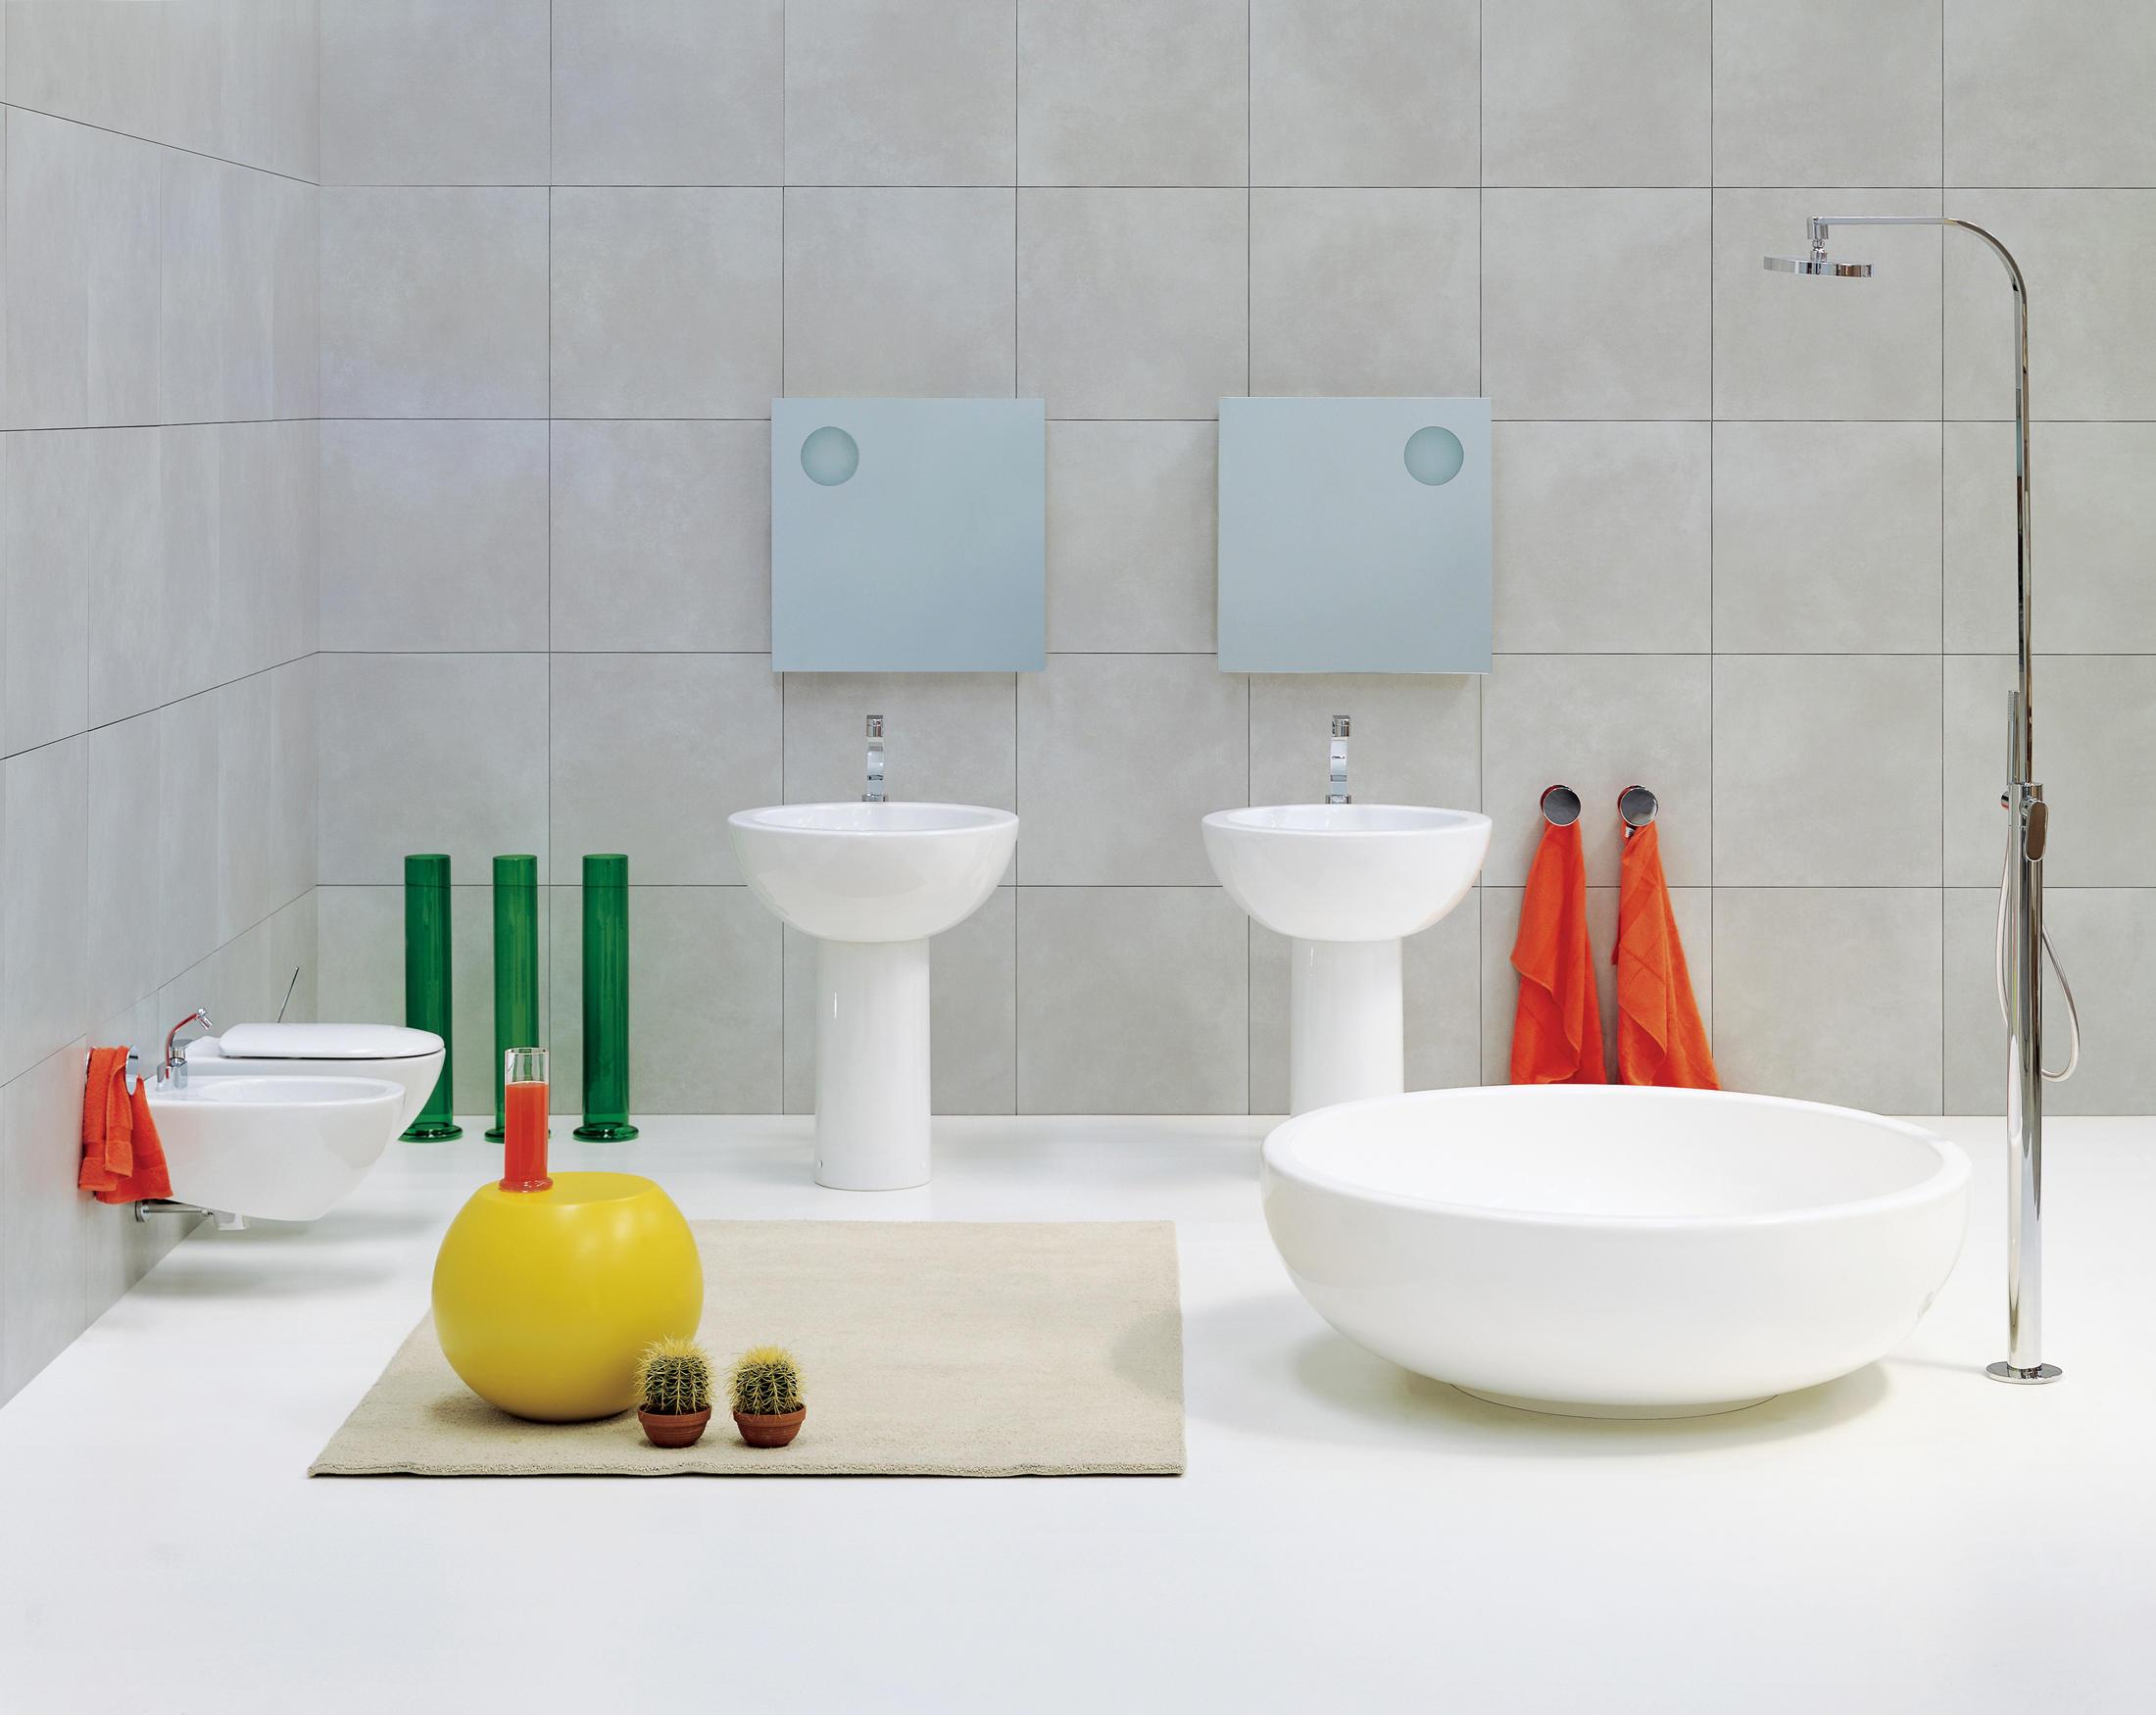 FONTANA VASCA-DOCCIA - Piatti doccia Ceramica Flaminia  Architonic